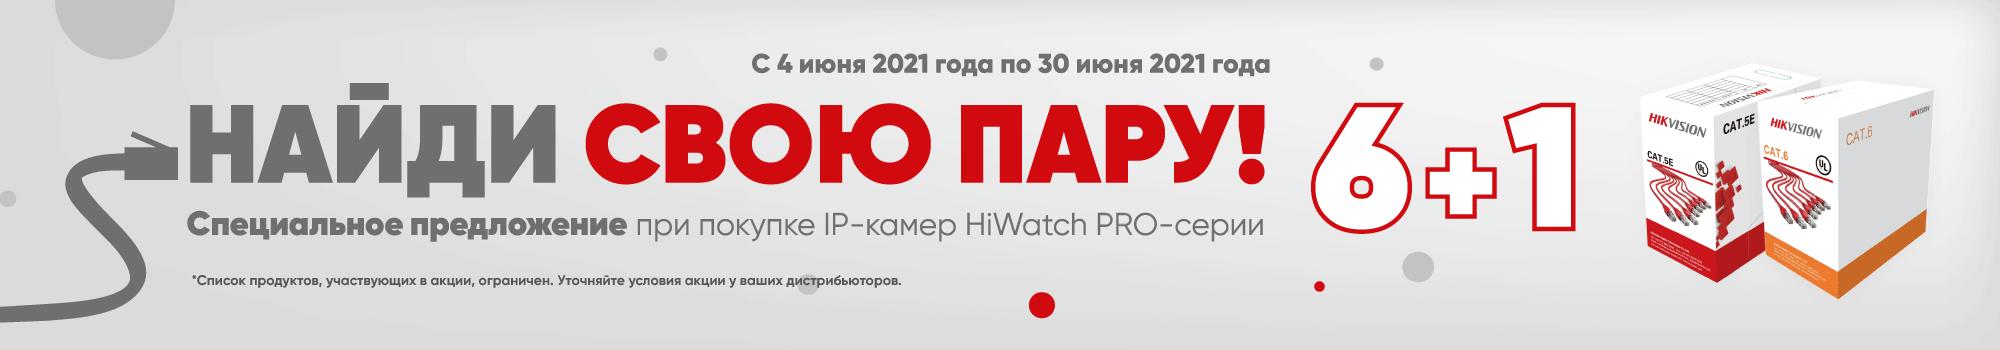 ---_2000350